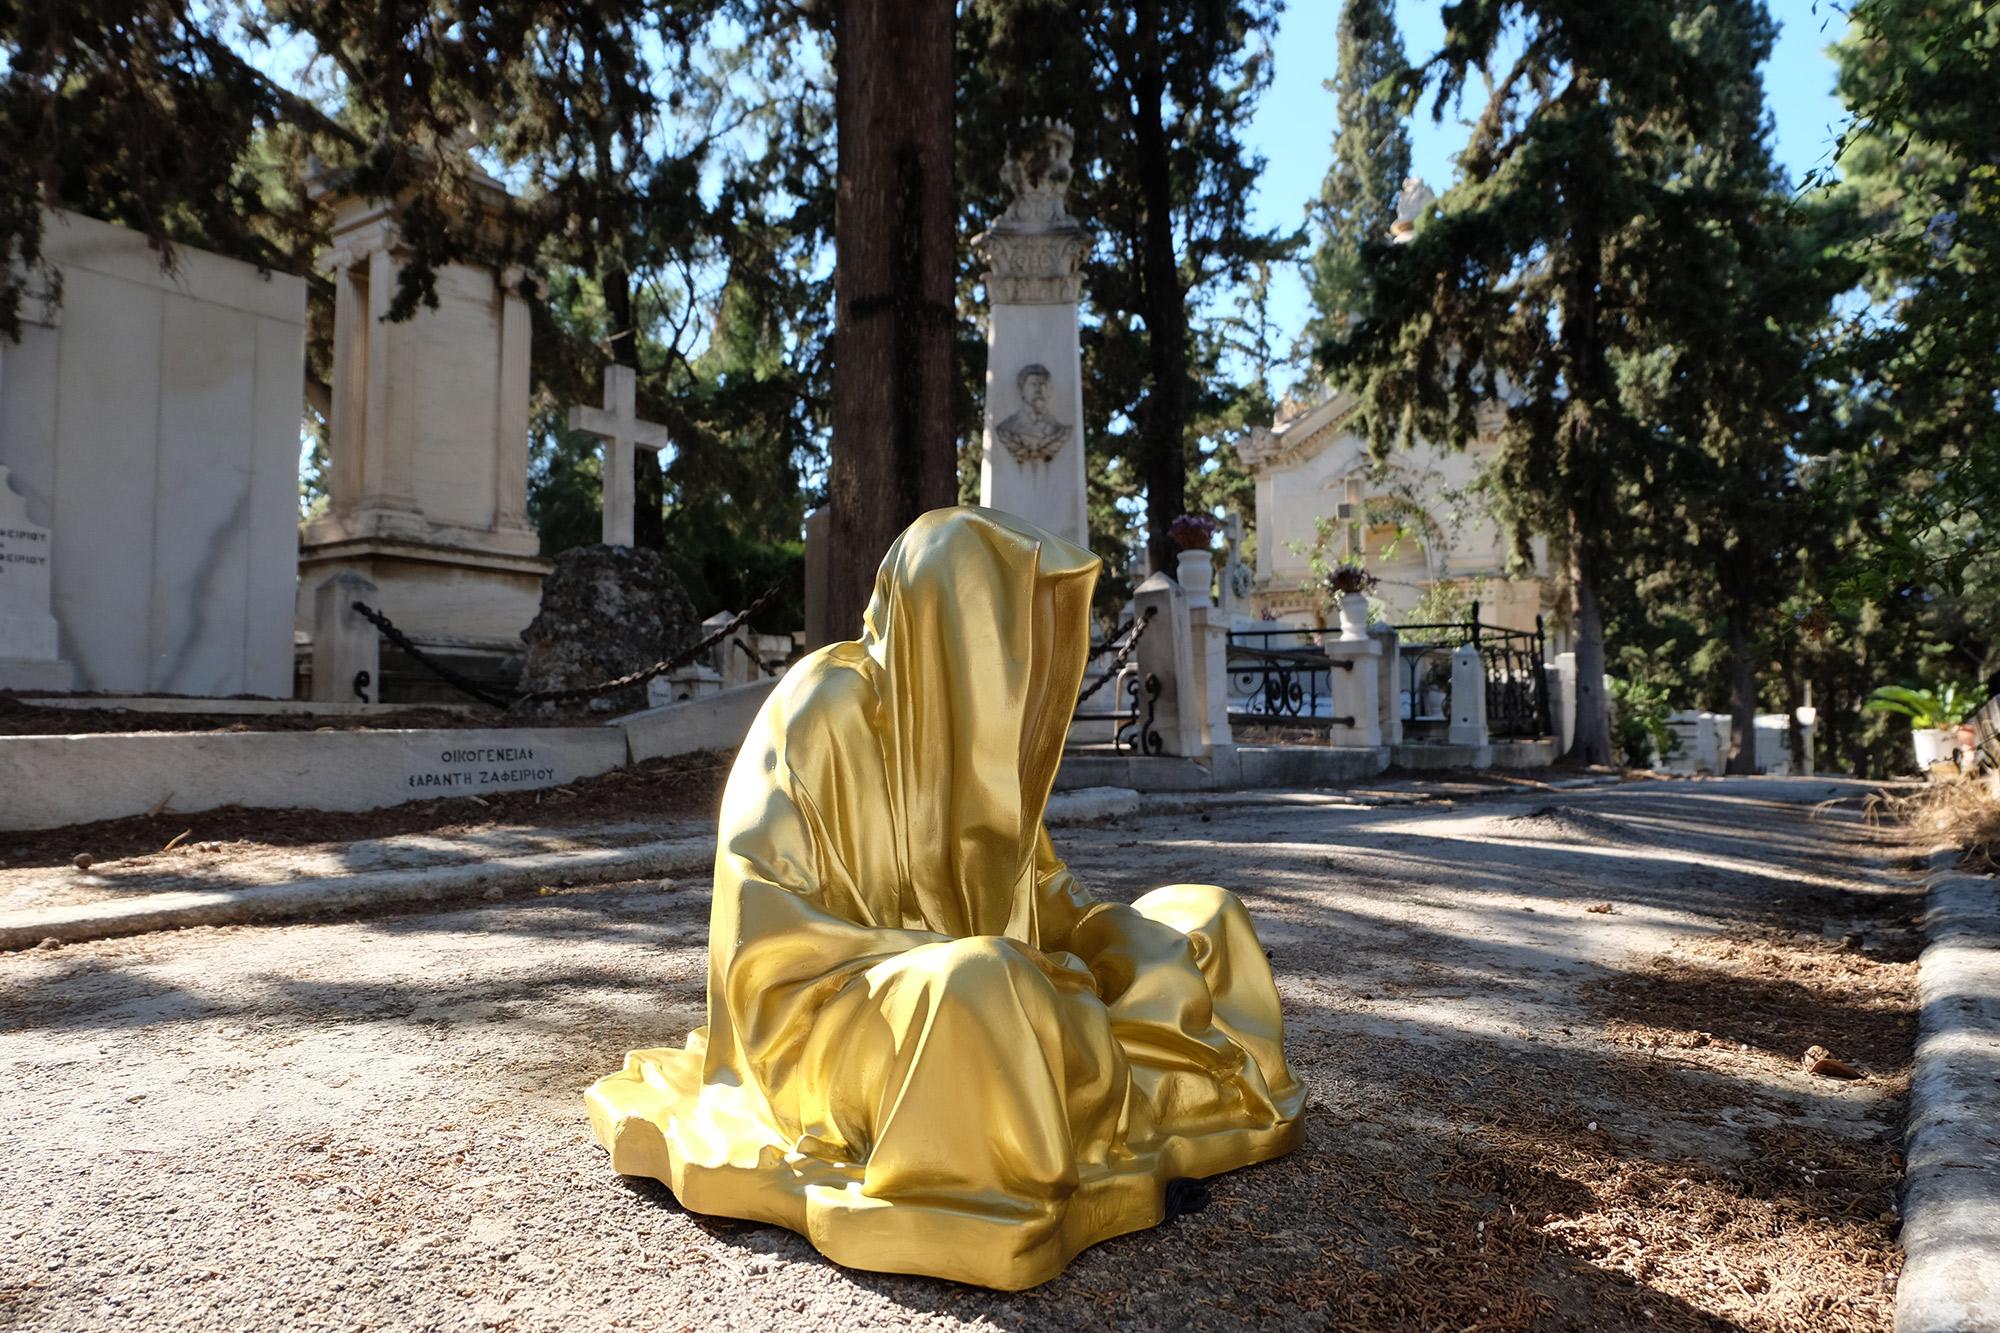 athens-acropolis-guardians-of-time-manfred-kili-kielnhofer-stone-marble-plastic-statue-sculpture-modern-art-fine-arts-arte-gallery-museum-show-8633